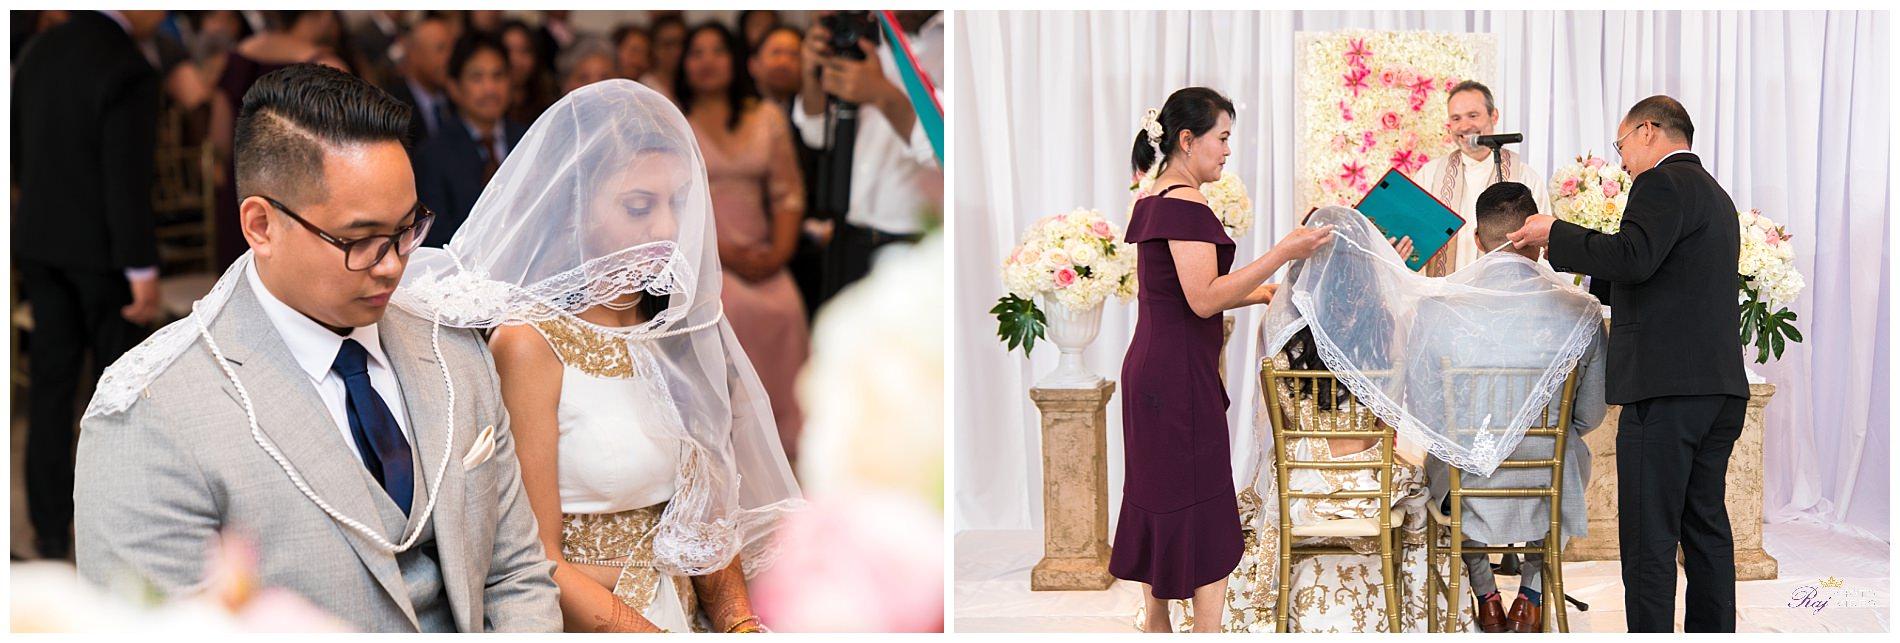 Royal-Manor-Garfield-NJ-Christian-Wedding-Ceremony-Khusbu-Jeff-46.jpg